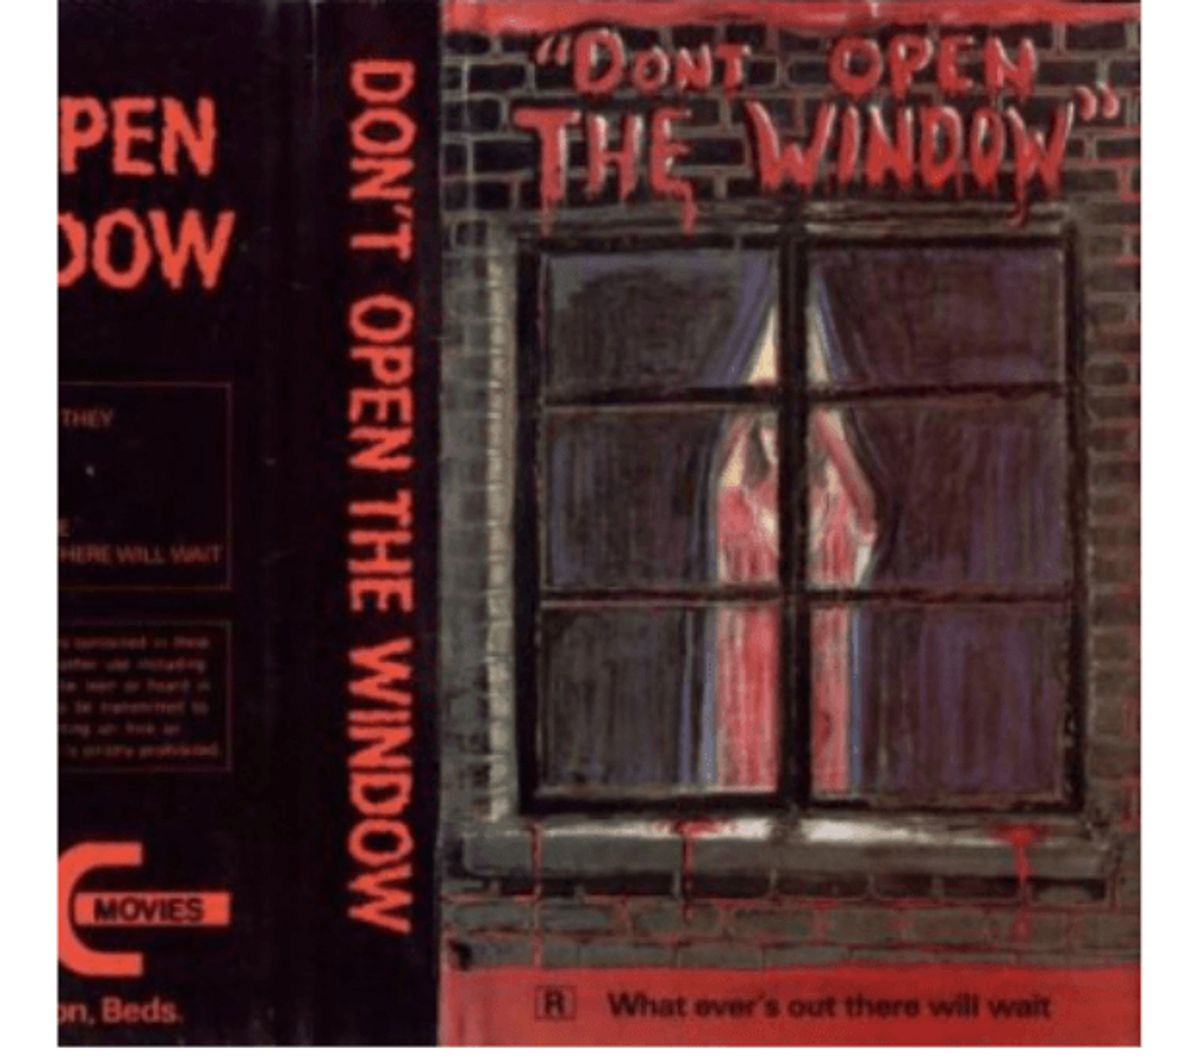 Dont Open the Window (Films of the 80s) – 9.000 kroner. Foto: DBA Guide